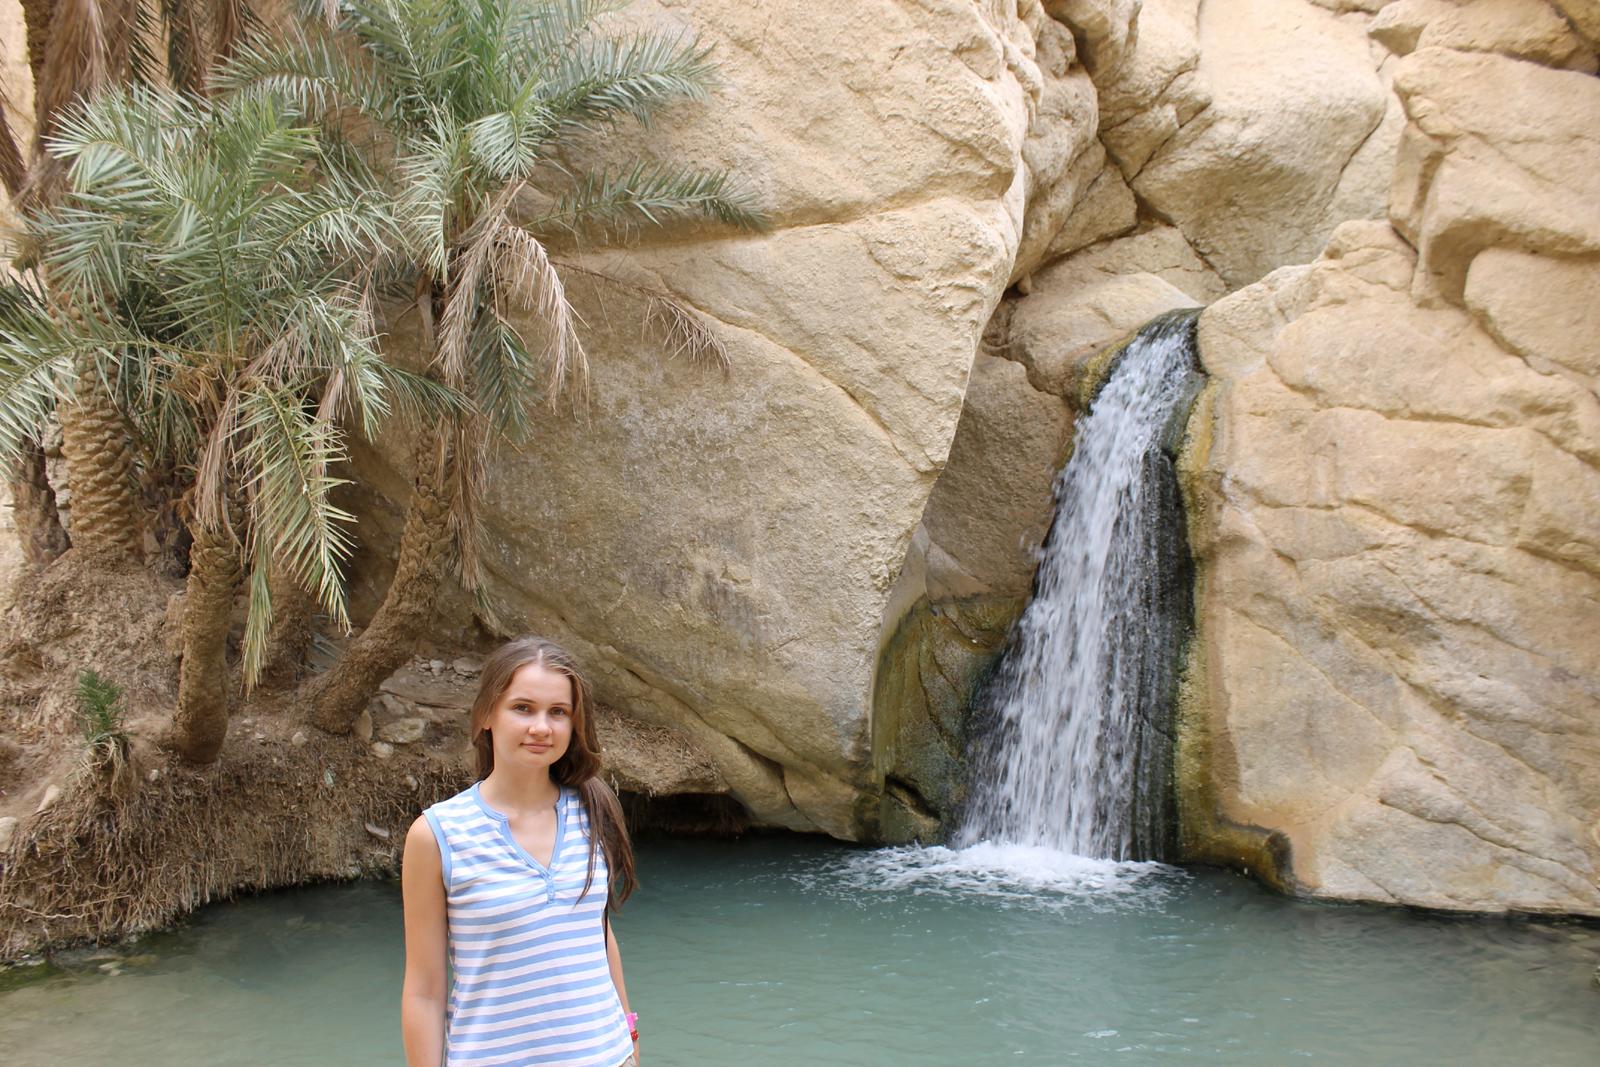 озеро и водопад в пустыне